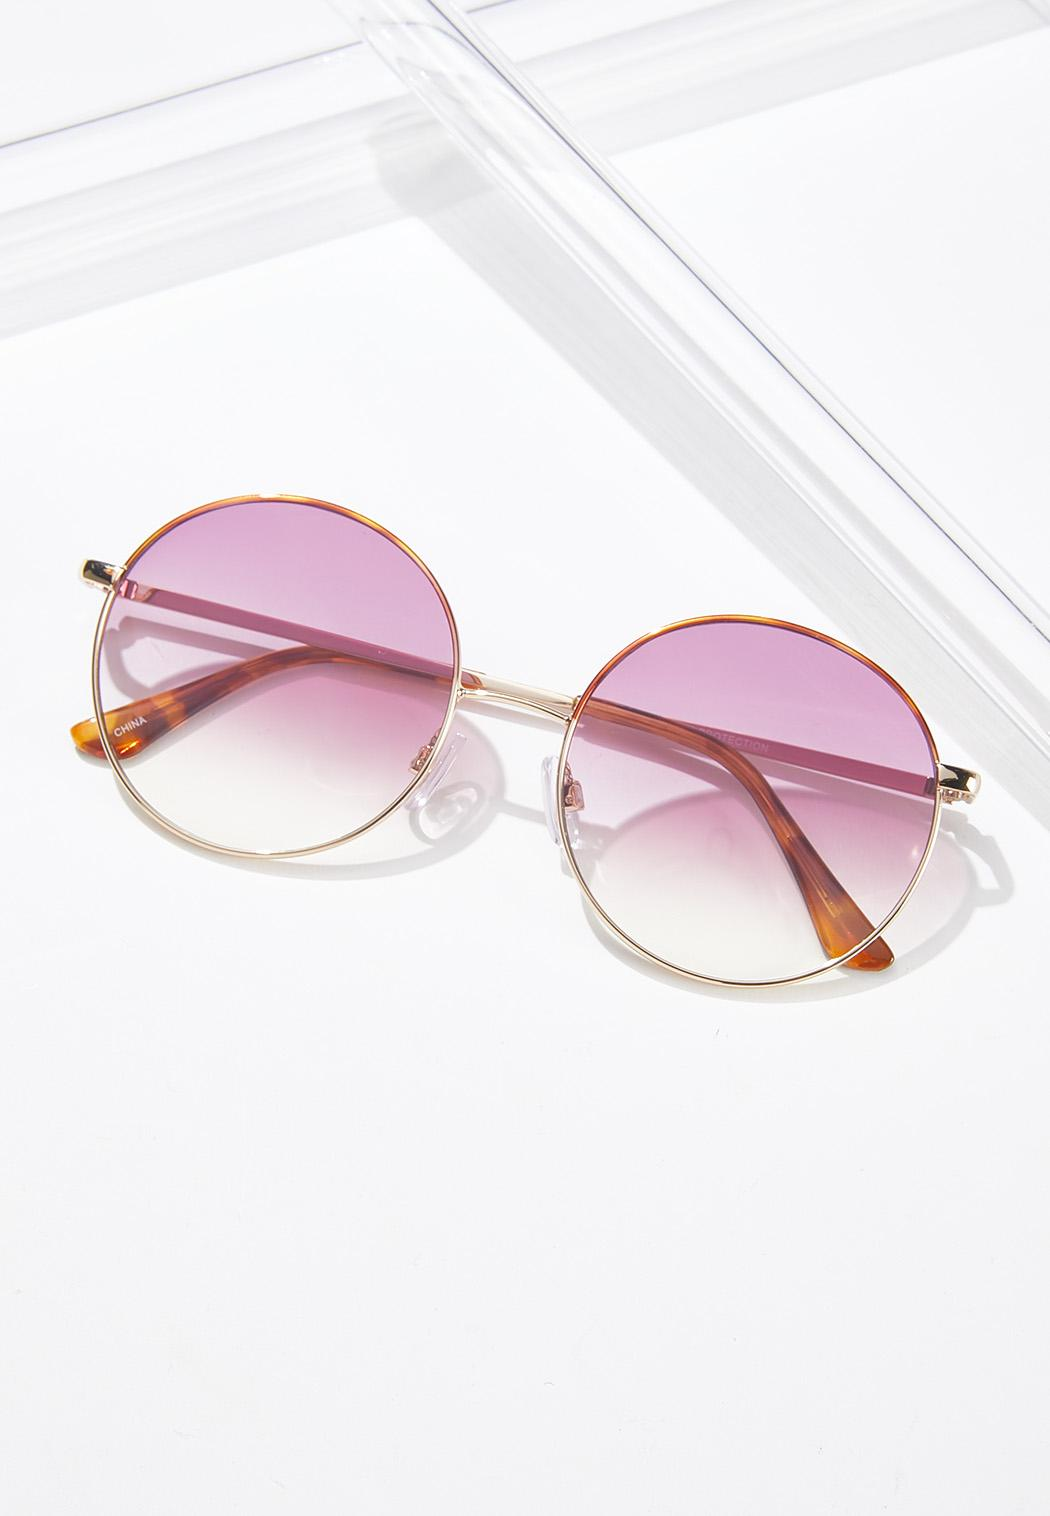 Pink Lens Round Sunglasses